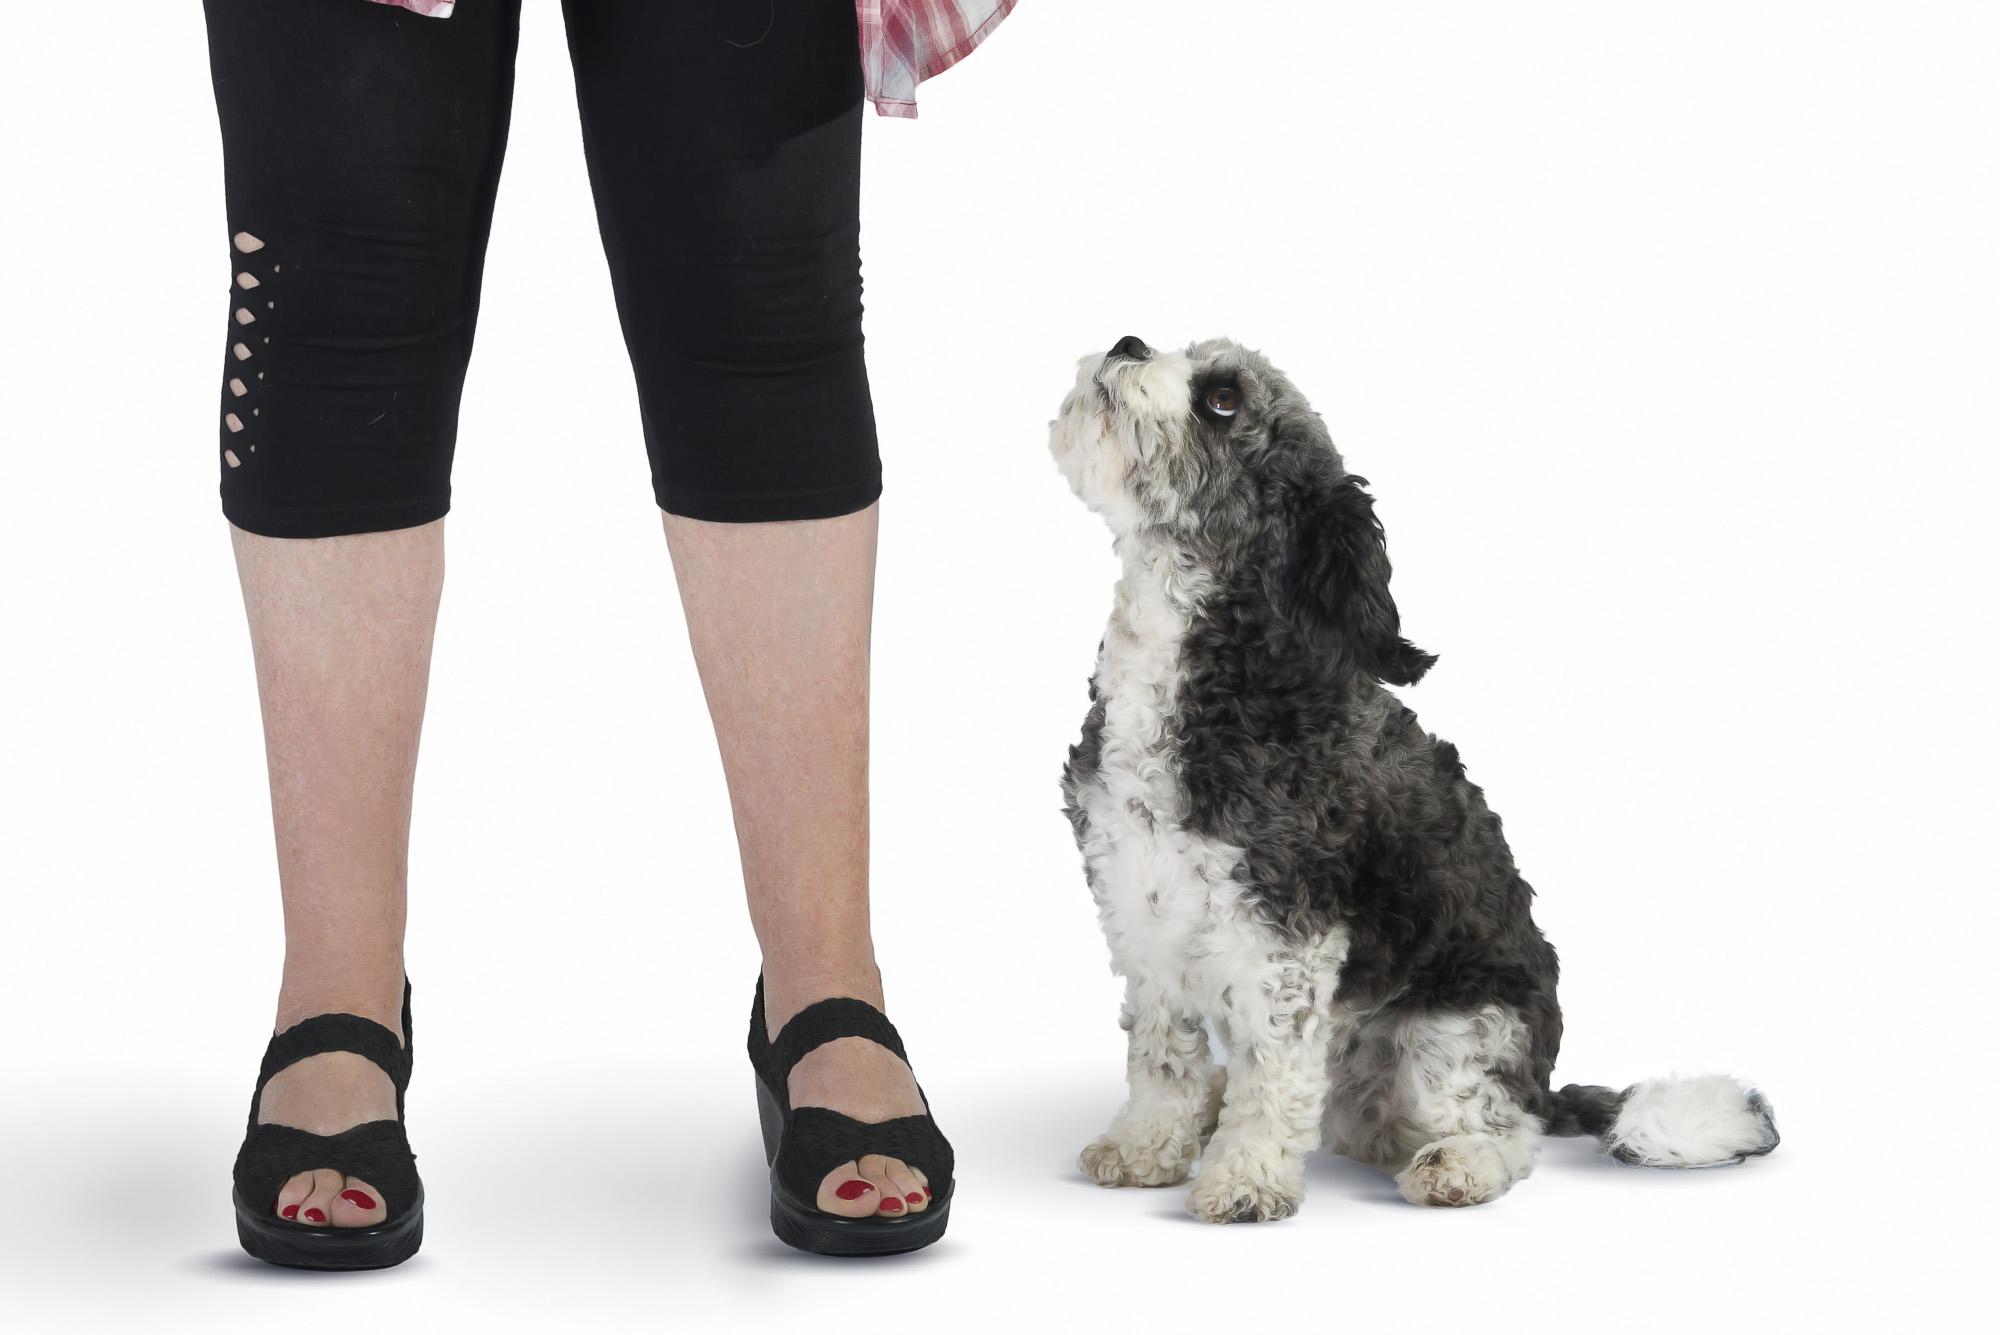 LupinBay-Dog-Pet-Photography-0118-1292.jpg